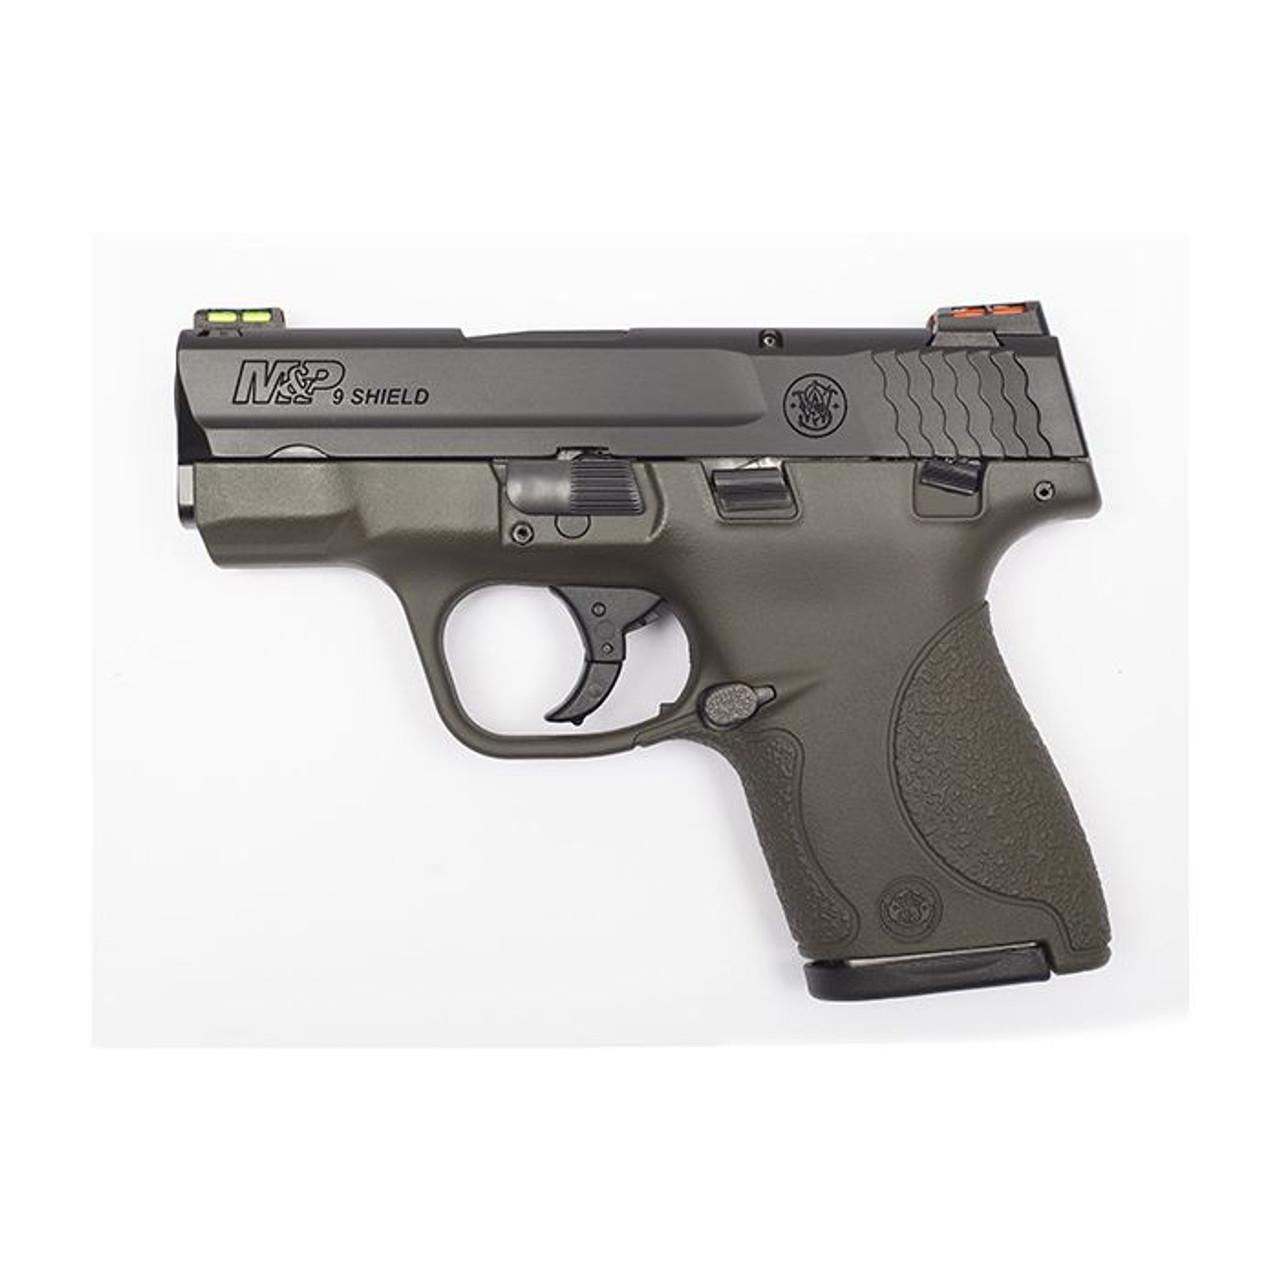 Smith & Wesson M&P 9 Shield Hi-Viz CALIFORNIA LEGAL - 9mm - ODG